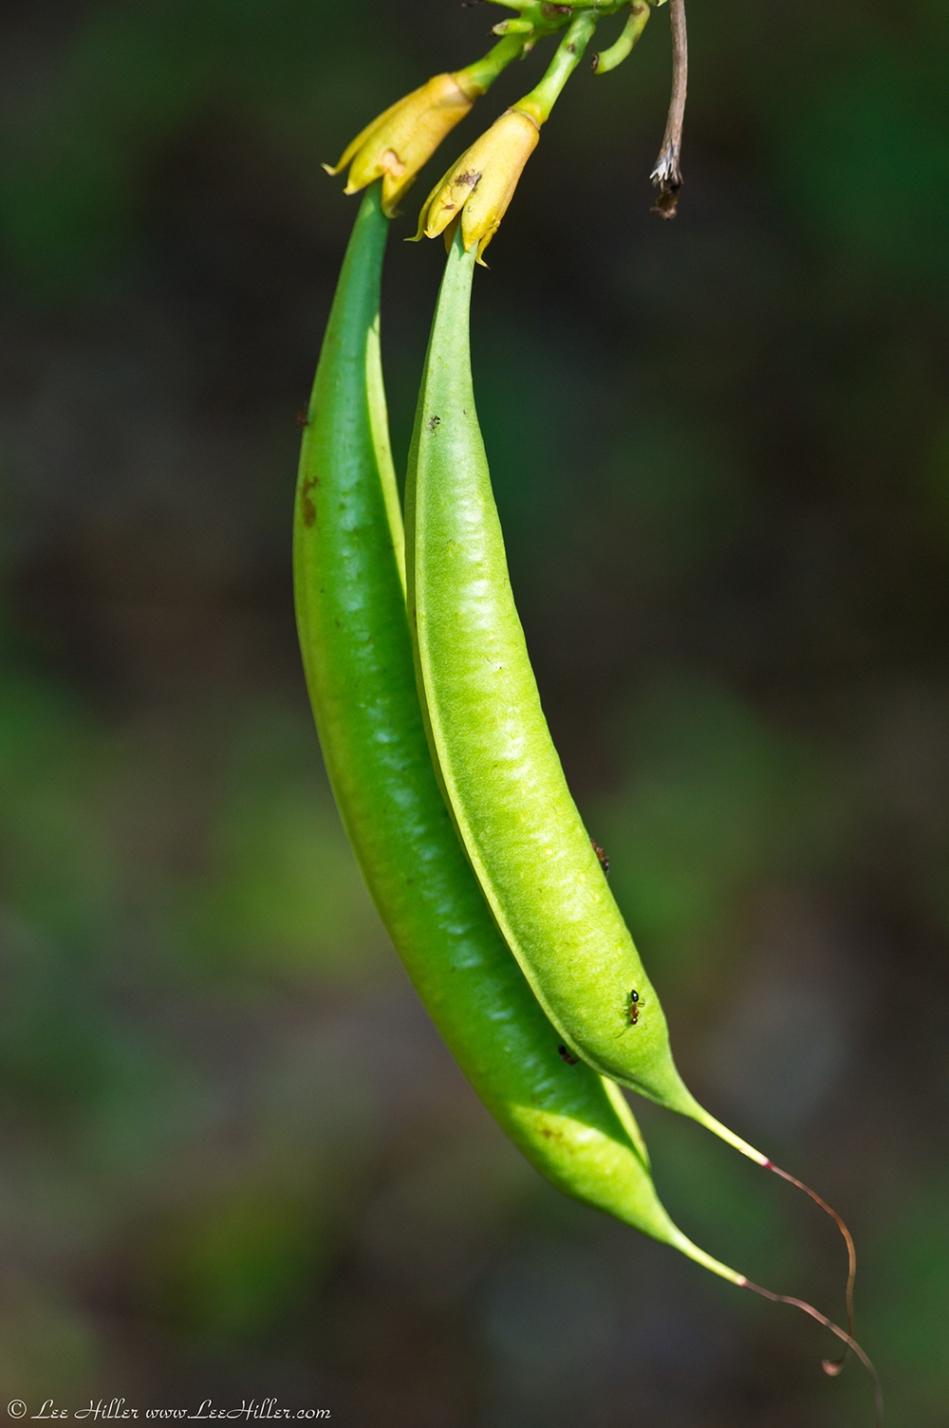 HSNP West Mountain Trail Green Beans?